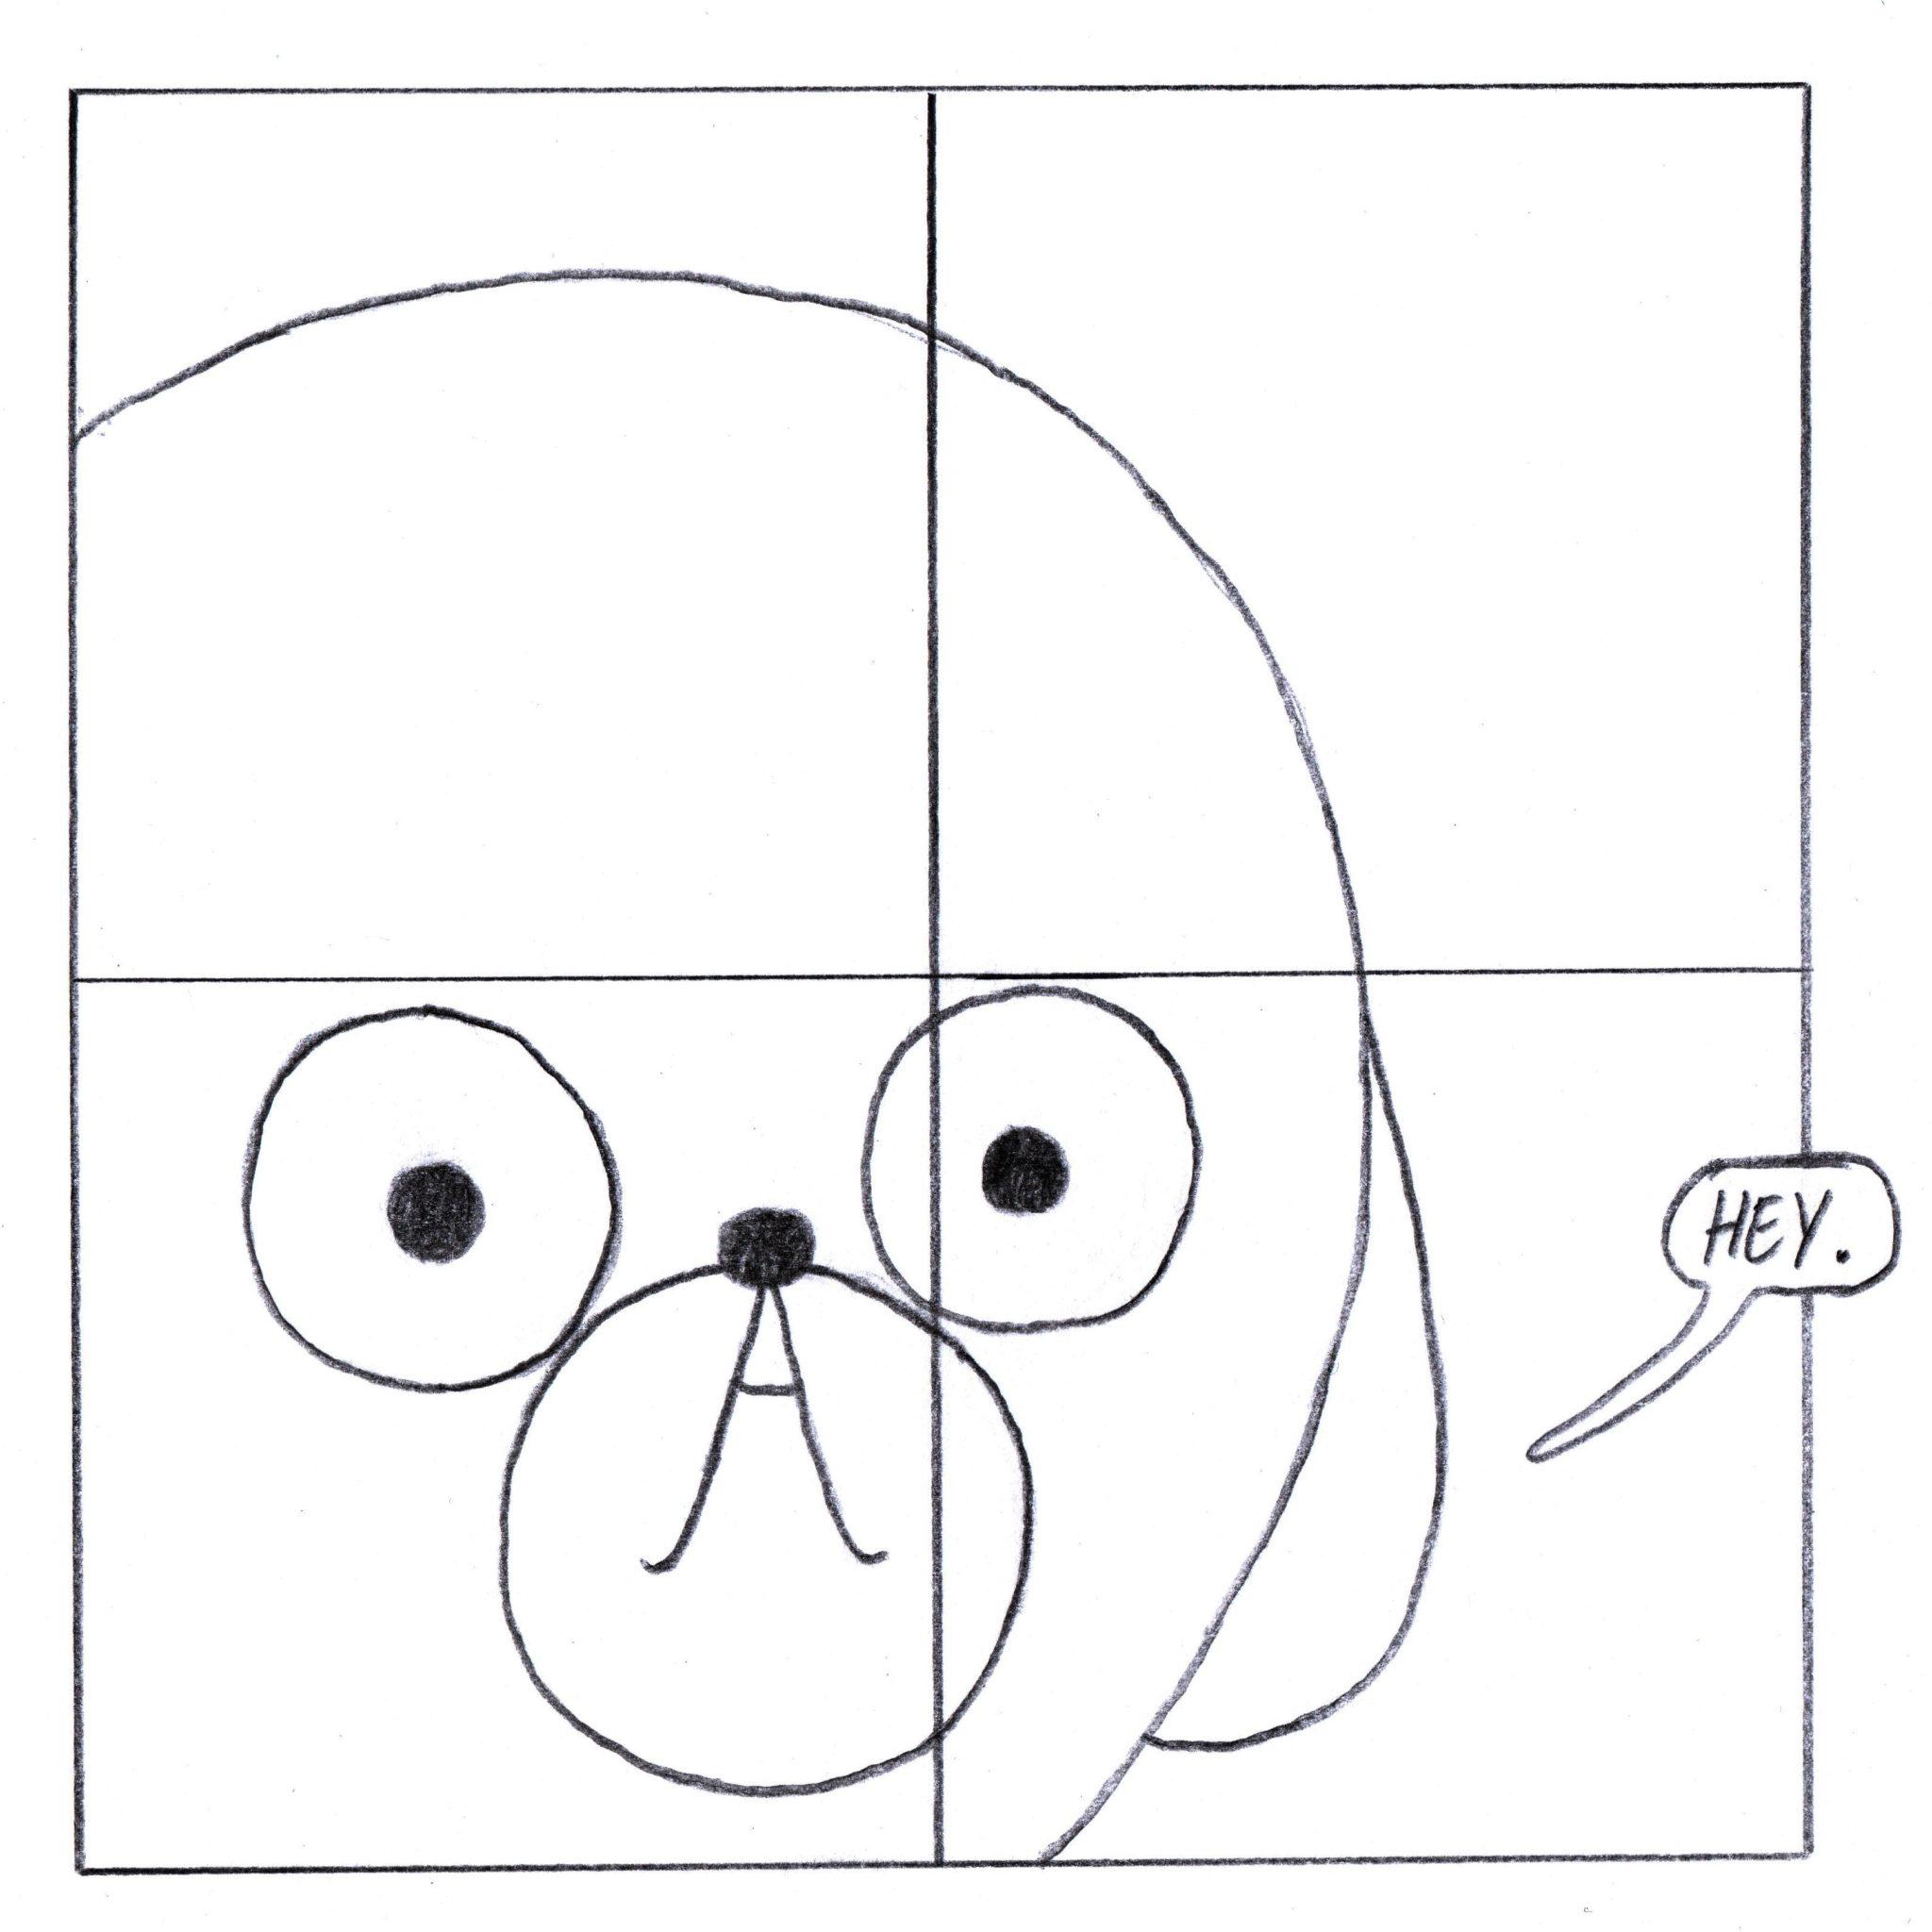 Dog Comics 151-155 - Page 1